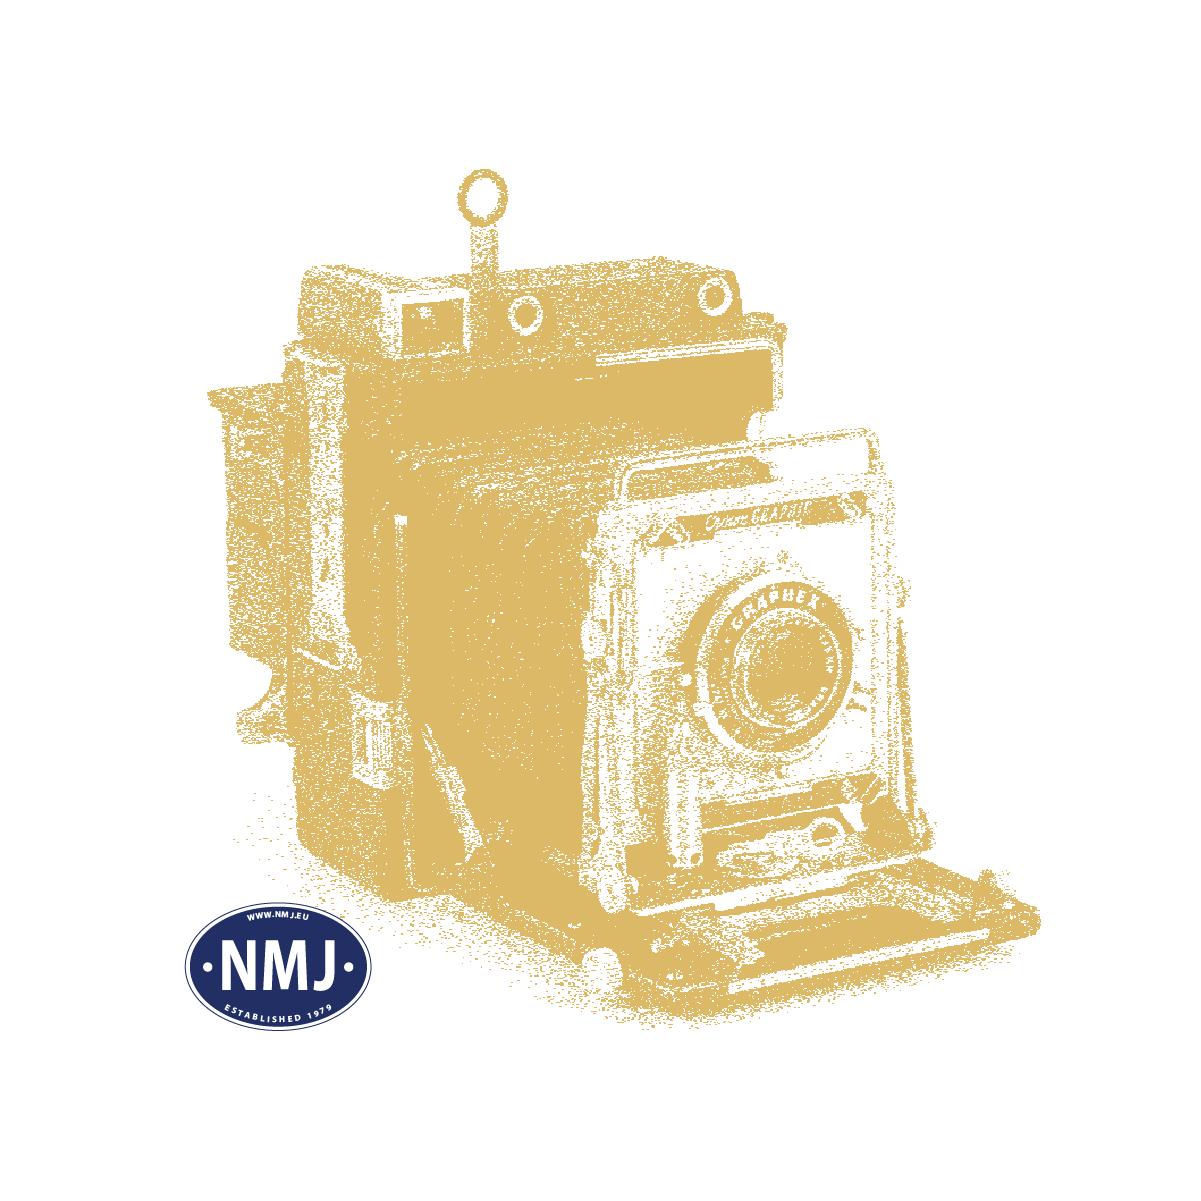 NMJT504.403 - NMJ Topline NSB His 210 2 597-2